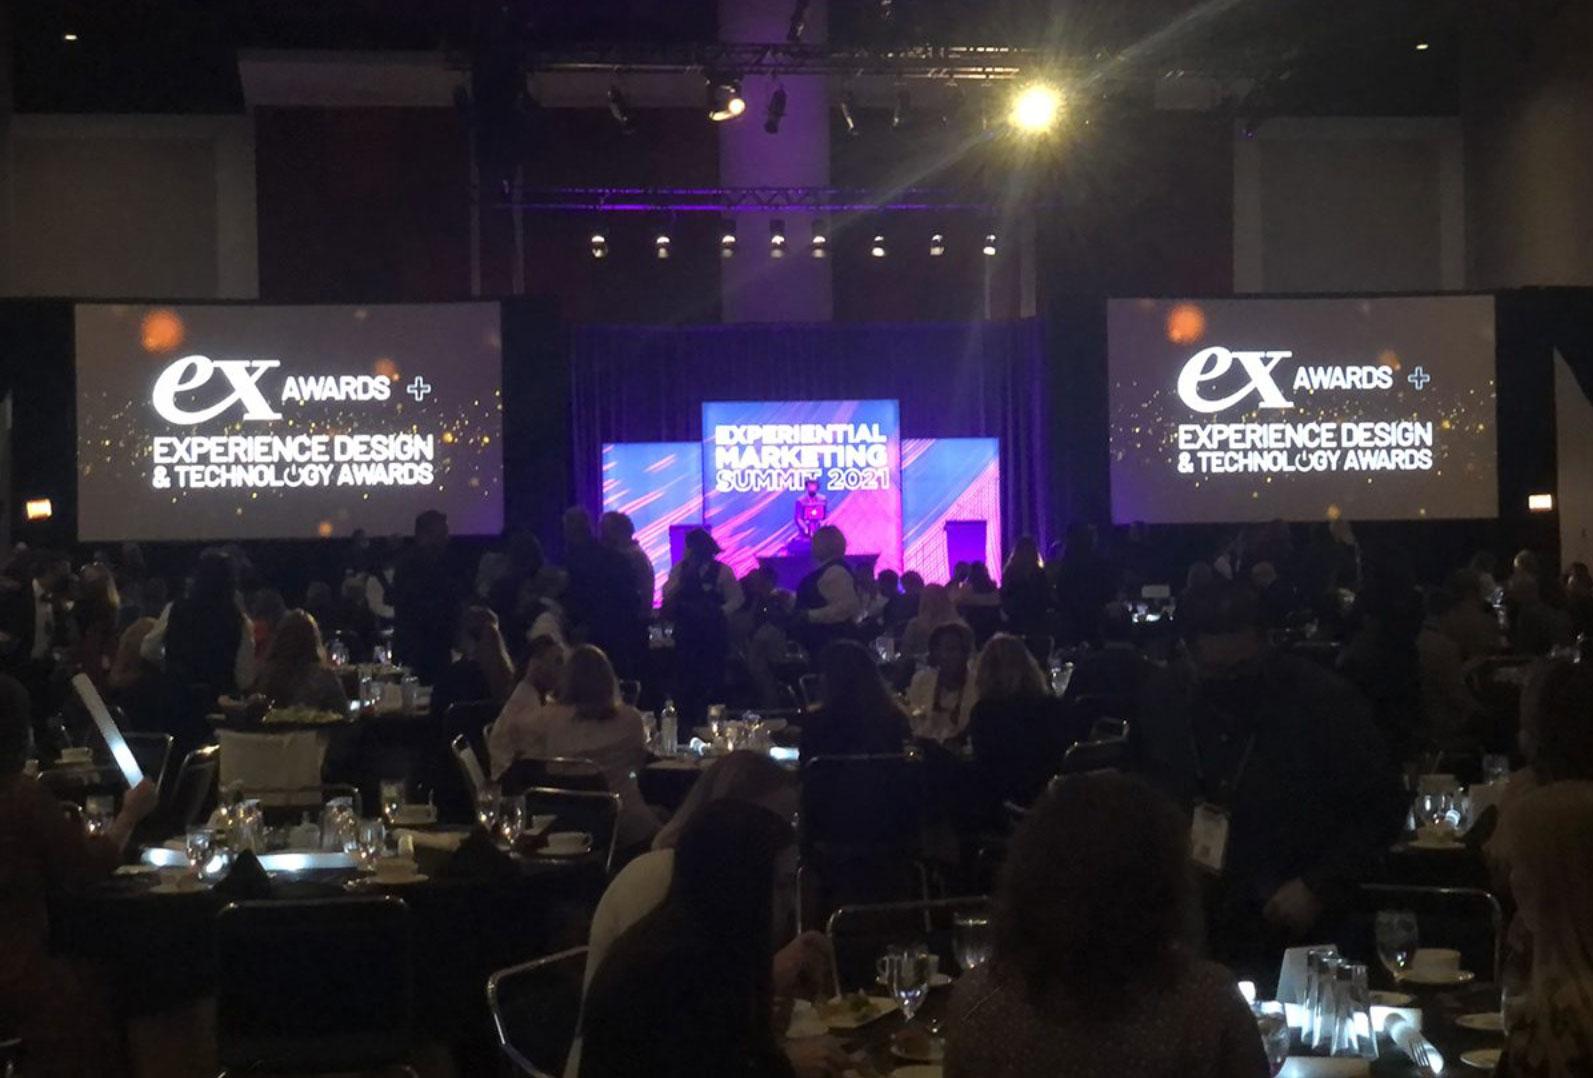 EX Awards